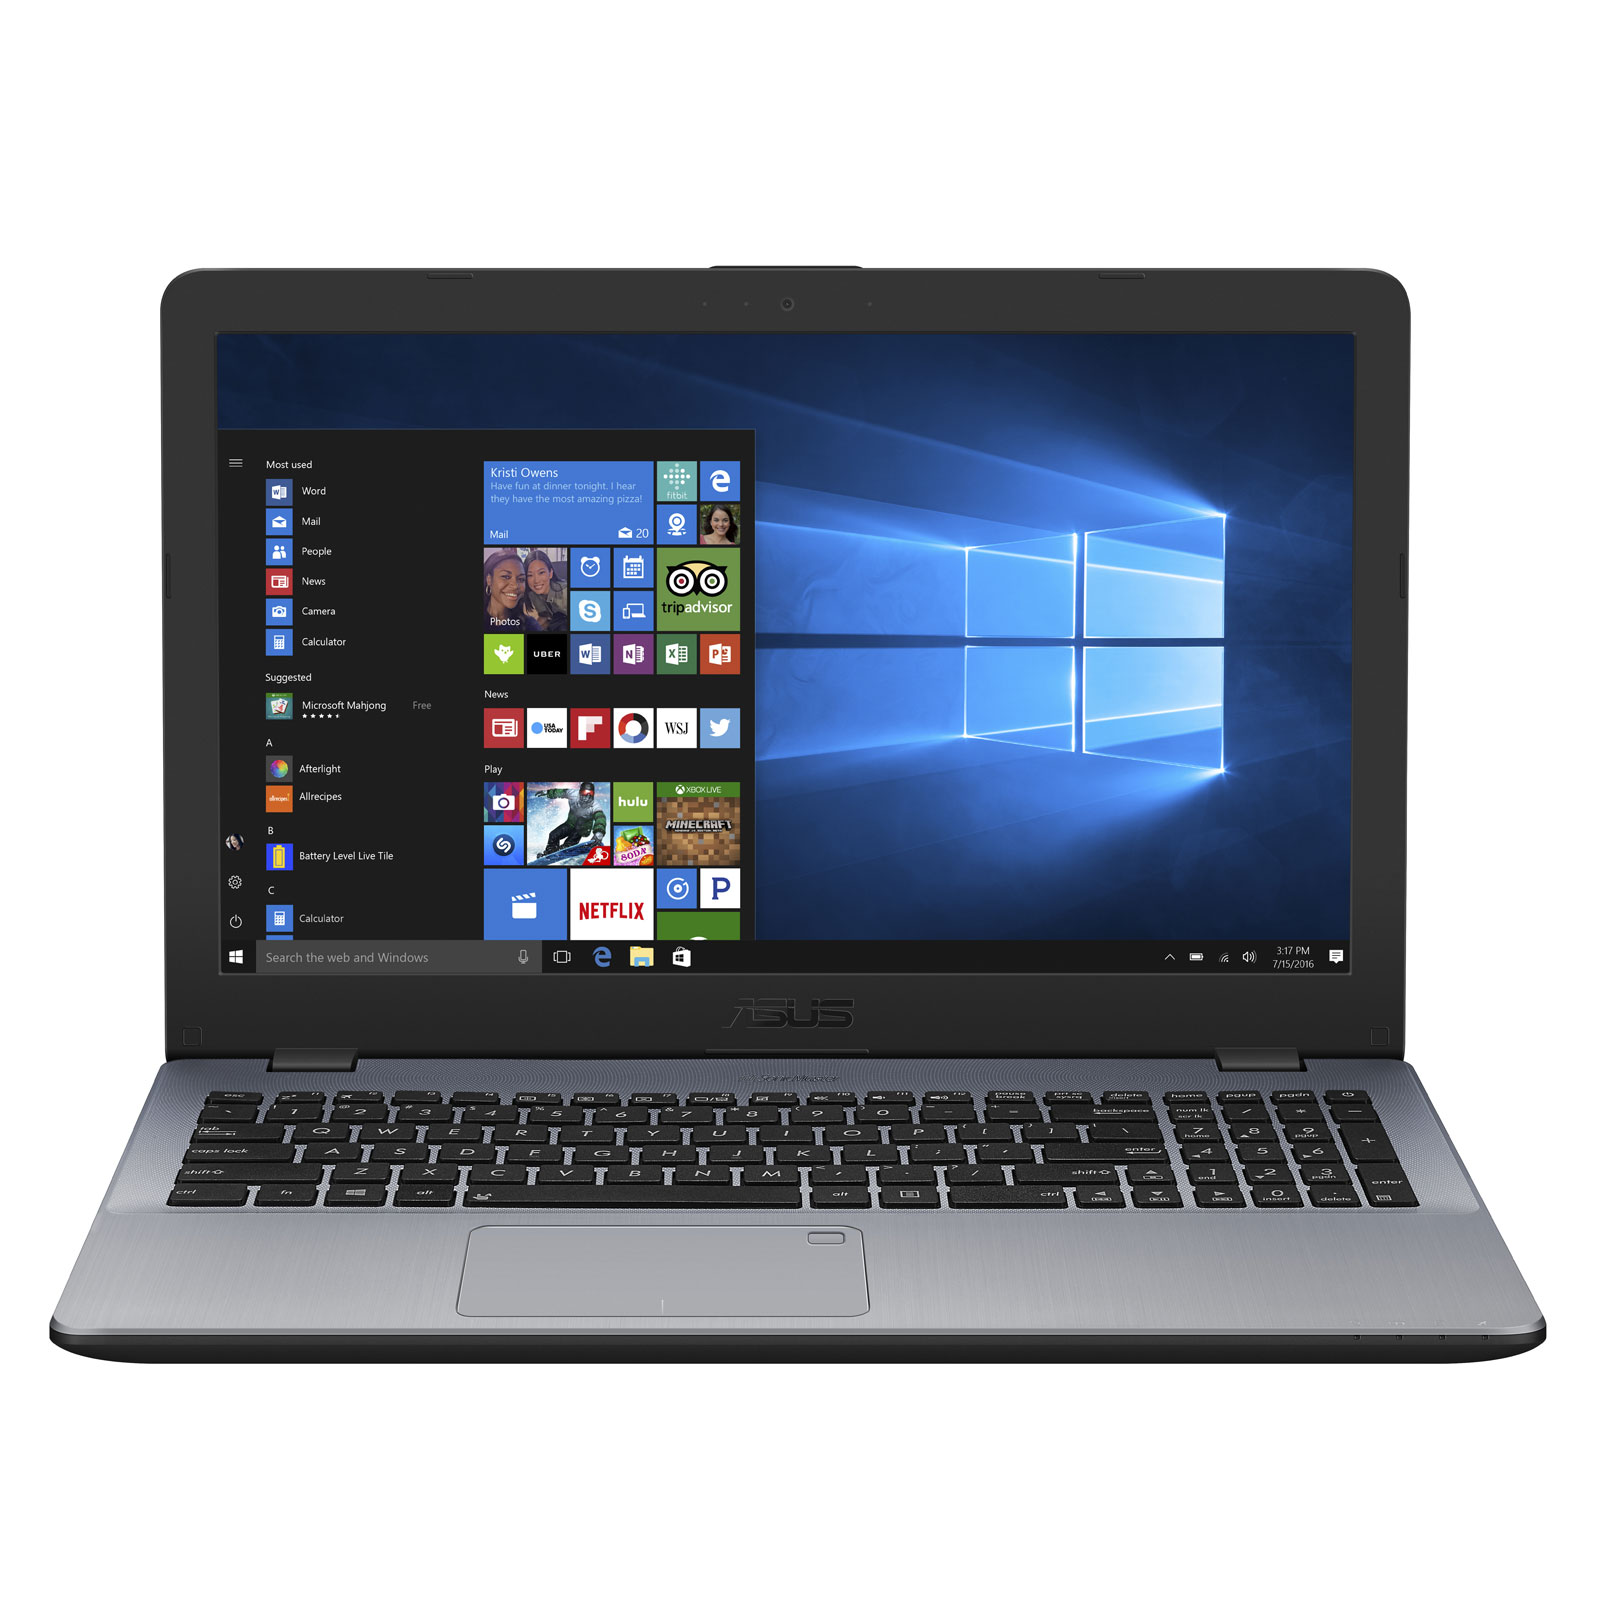 PC portable Asus P1501UA-GQ599R (90NB0F22-M08110) - Achat / Vente PC portable sur Picata.fr - 0